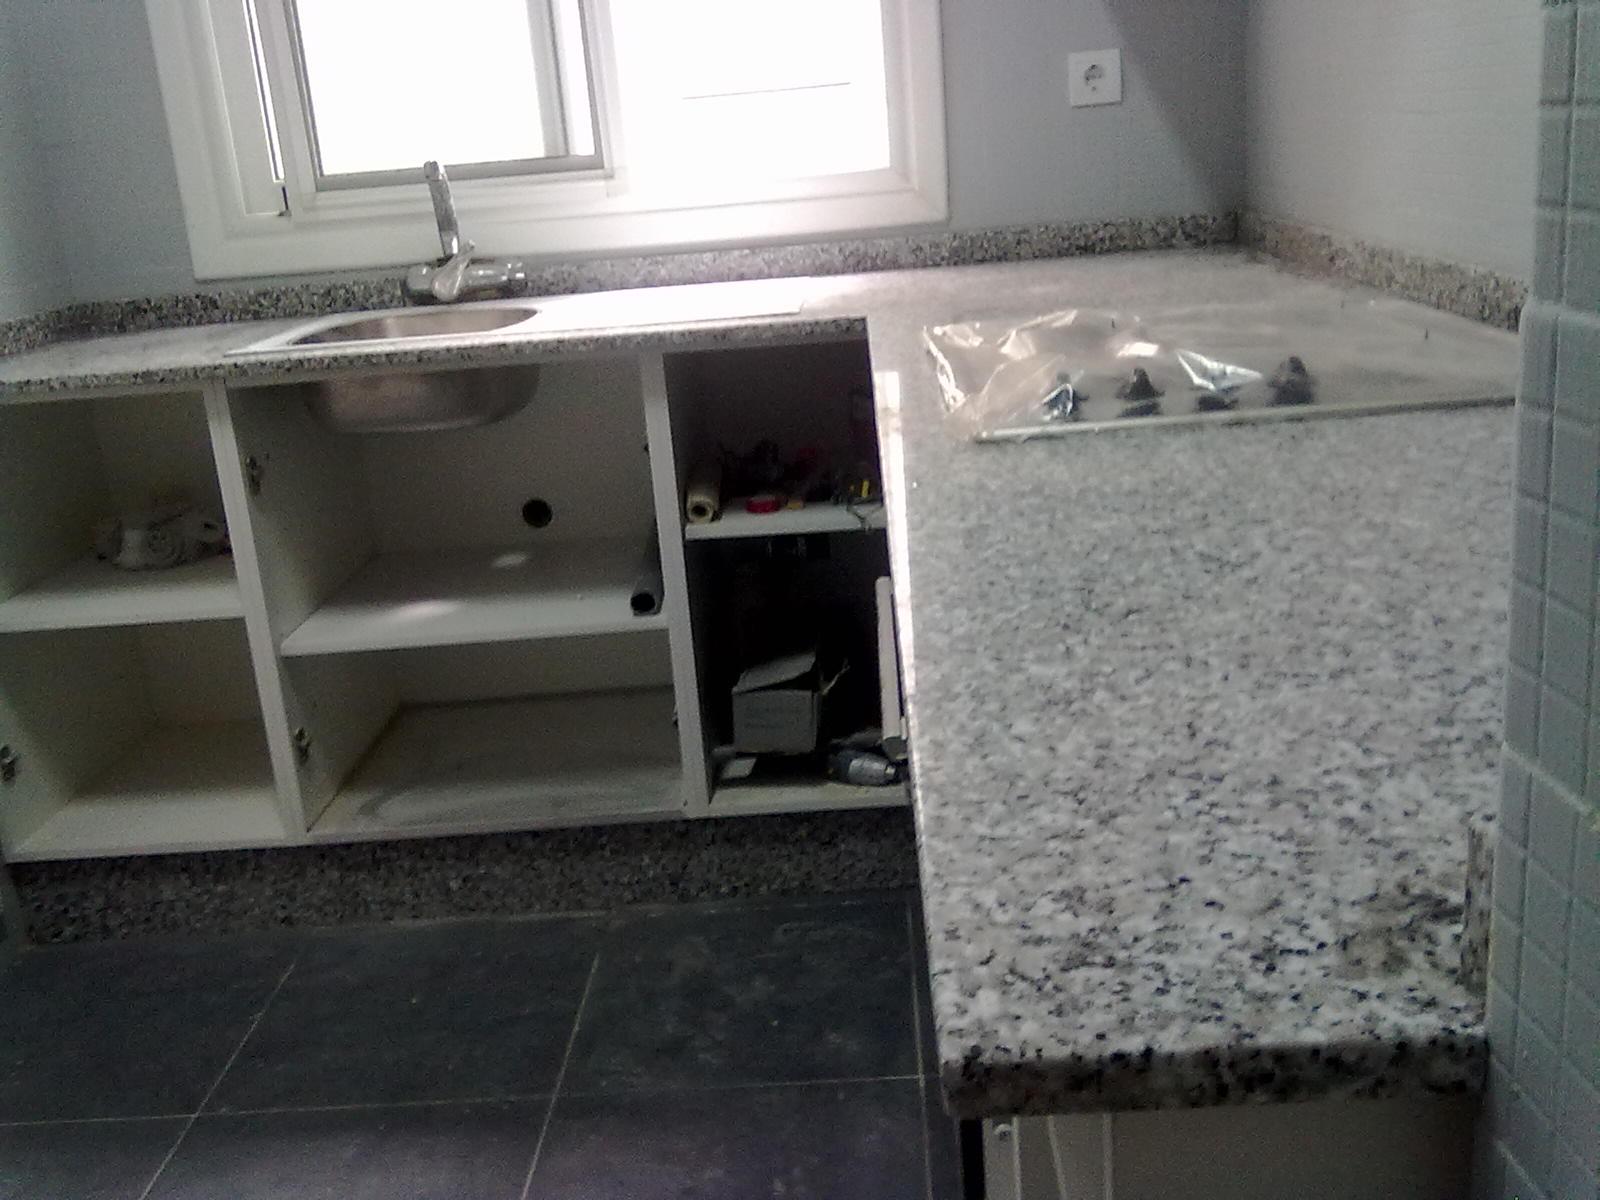 Marmoles vedat s l u montaje encimera granito blanco perla - Encimera granito blanco ...